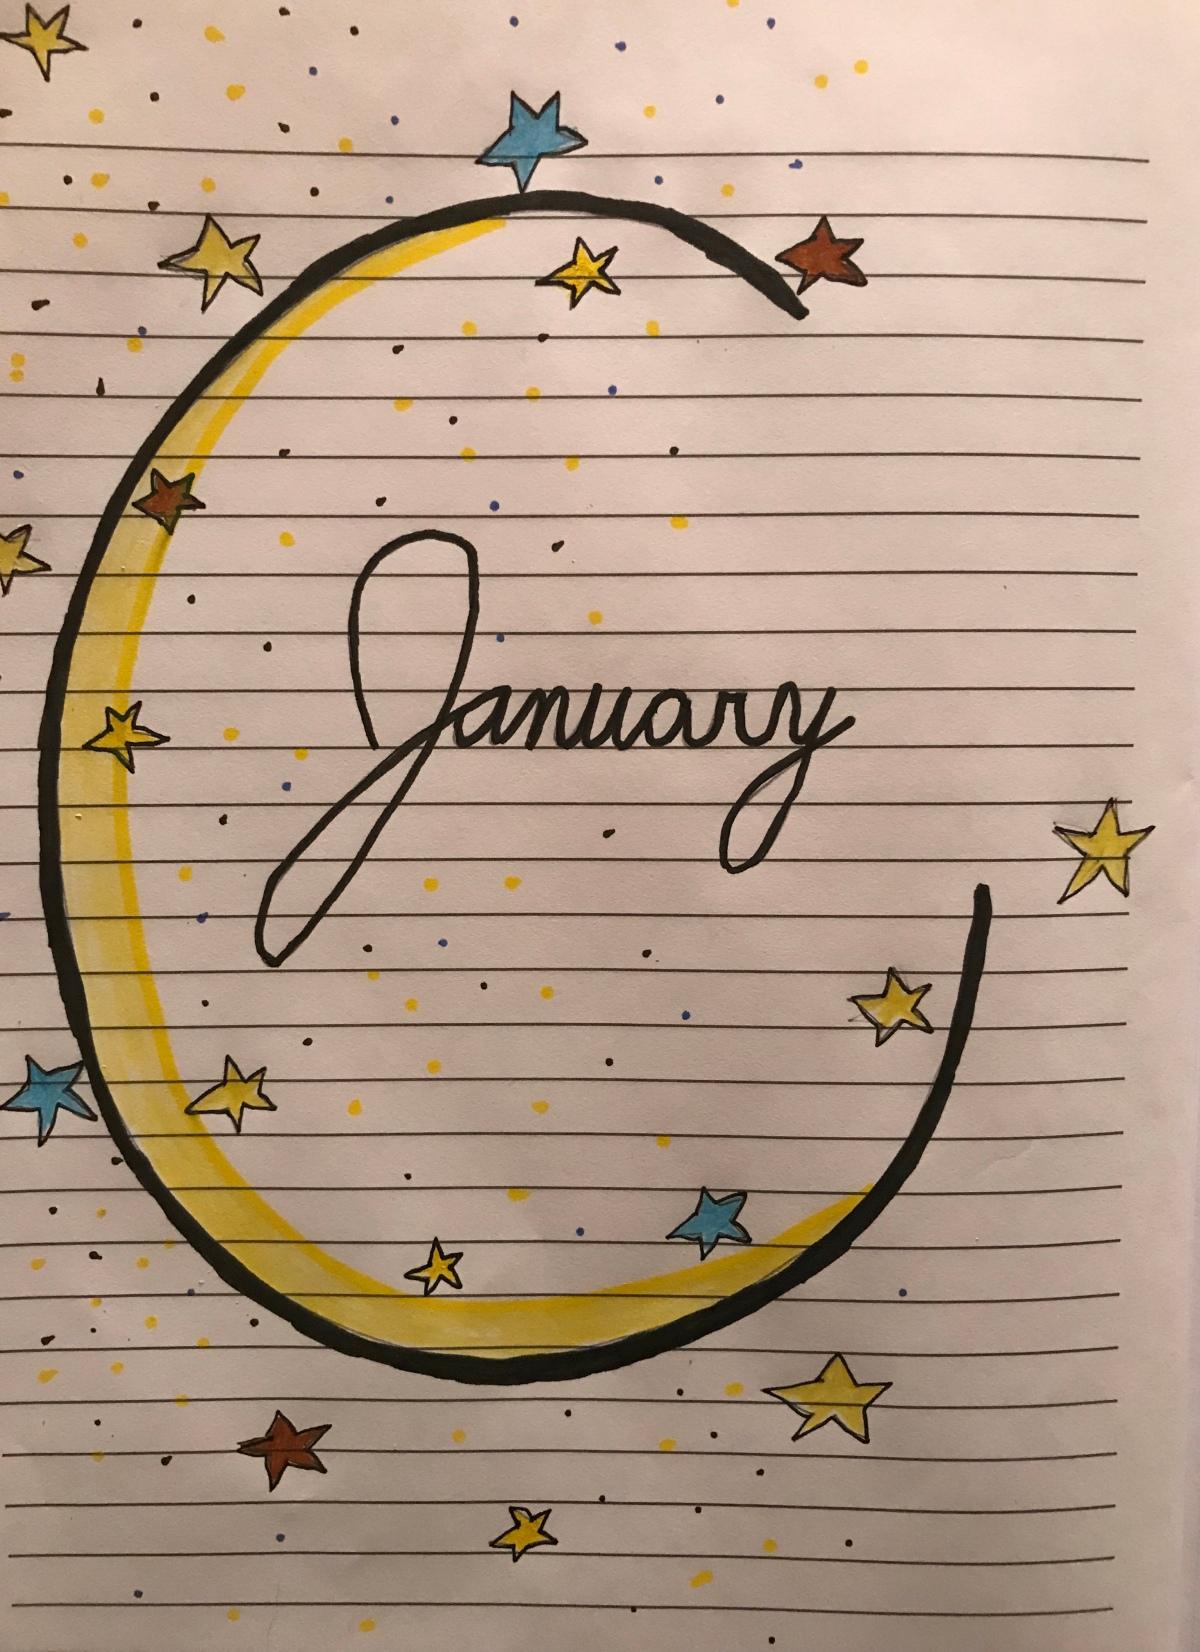 January2019